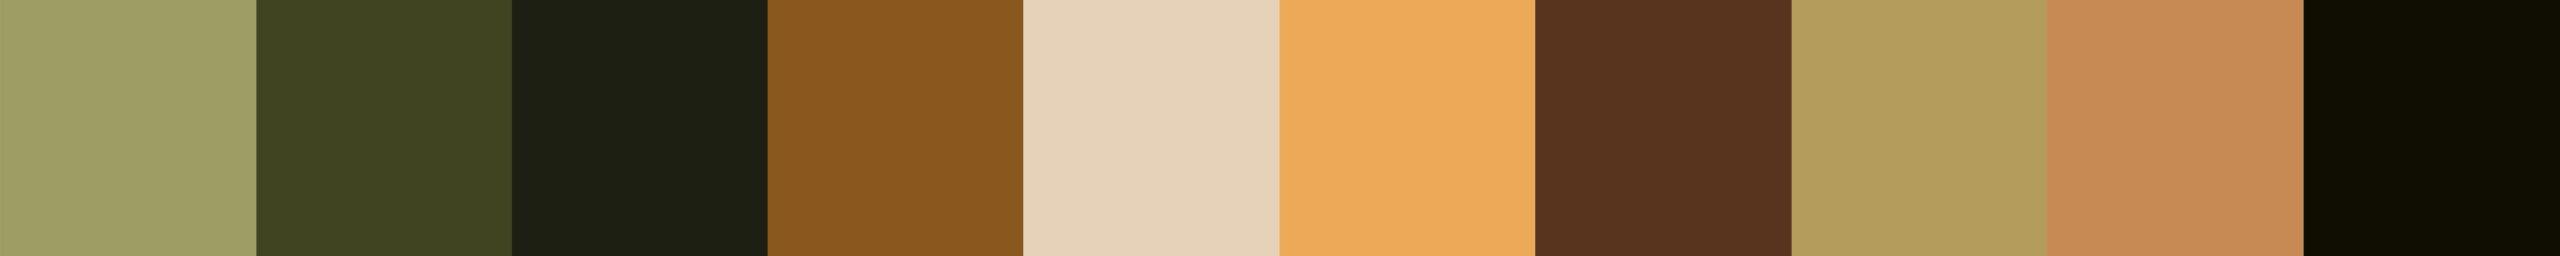 29 Pidrama Color Palette